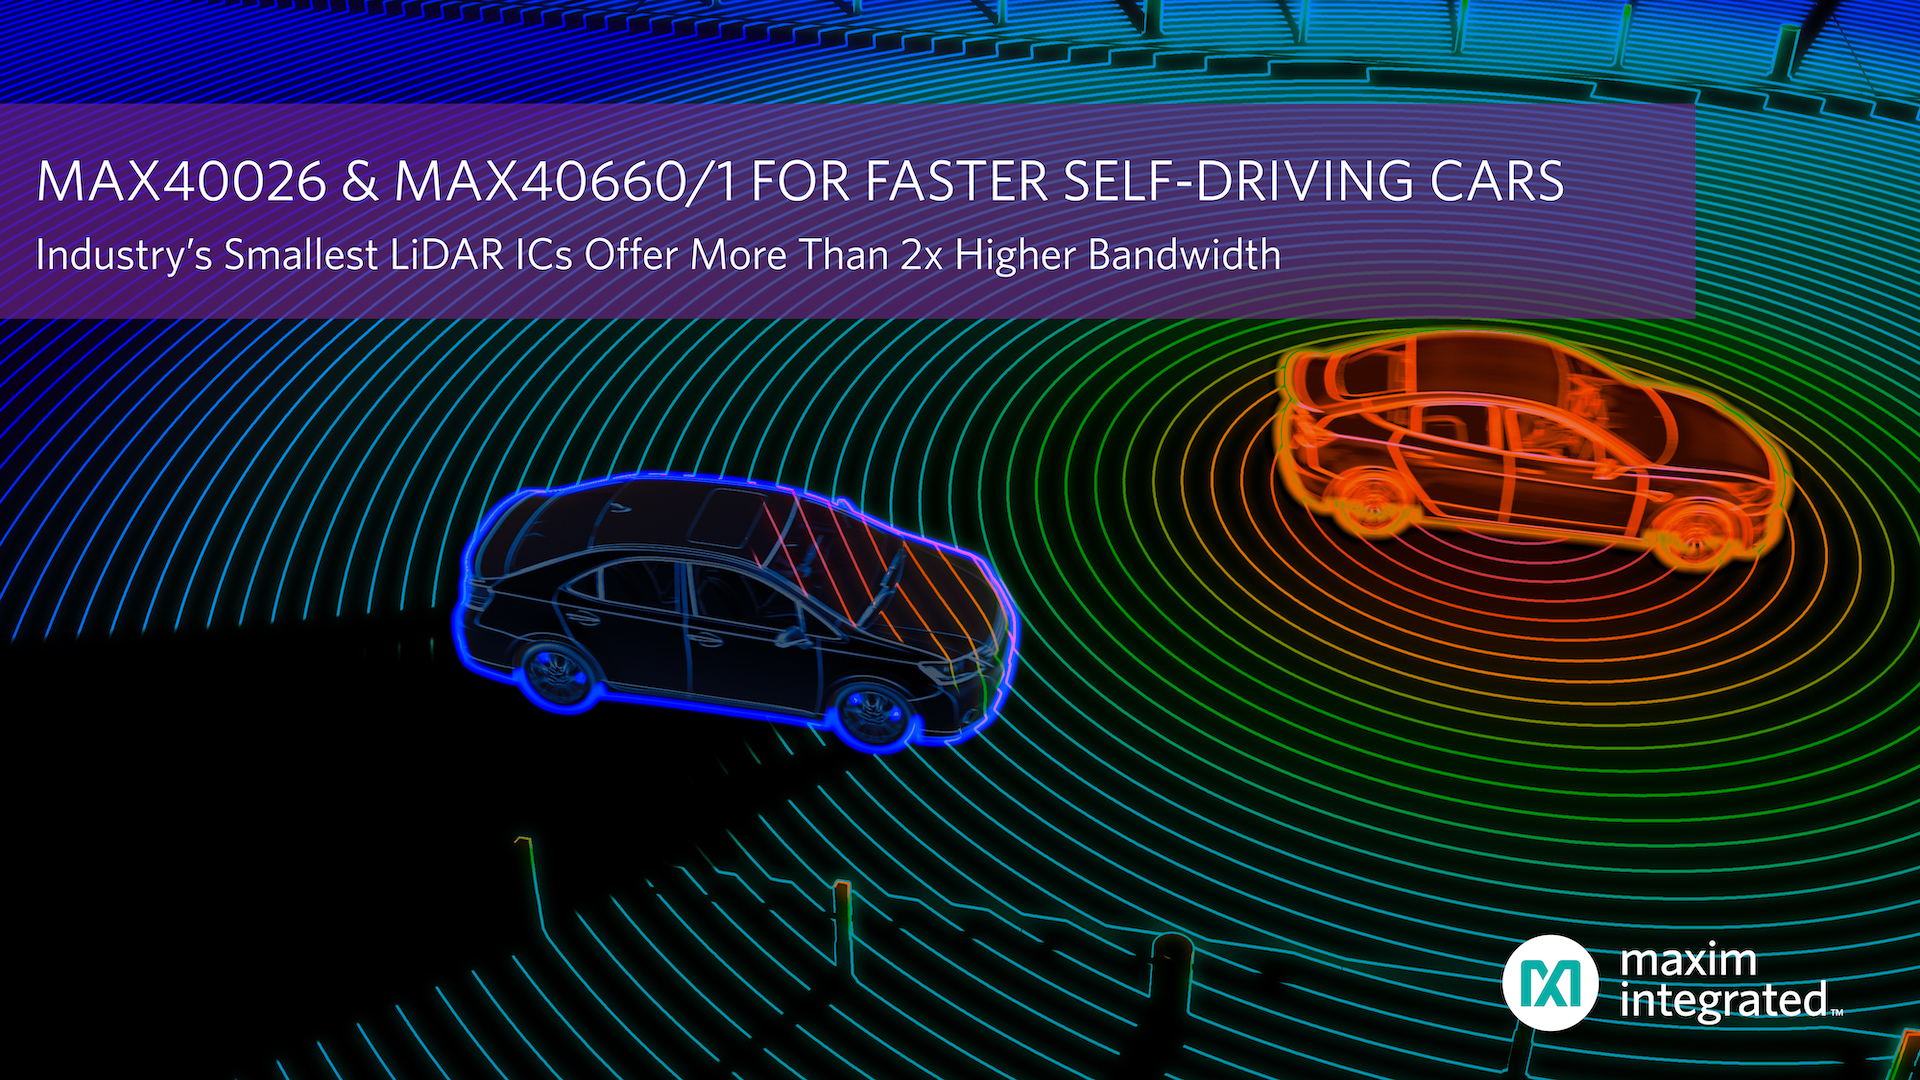 Maxim發布業界最小的LiDAR IC,帶寬提高2倍以上,加速自動駕駛汽車平臺設計